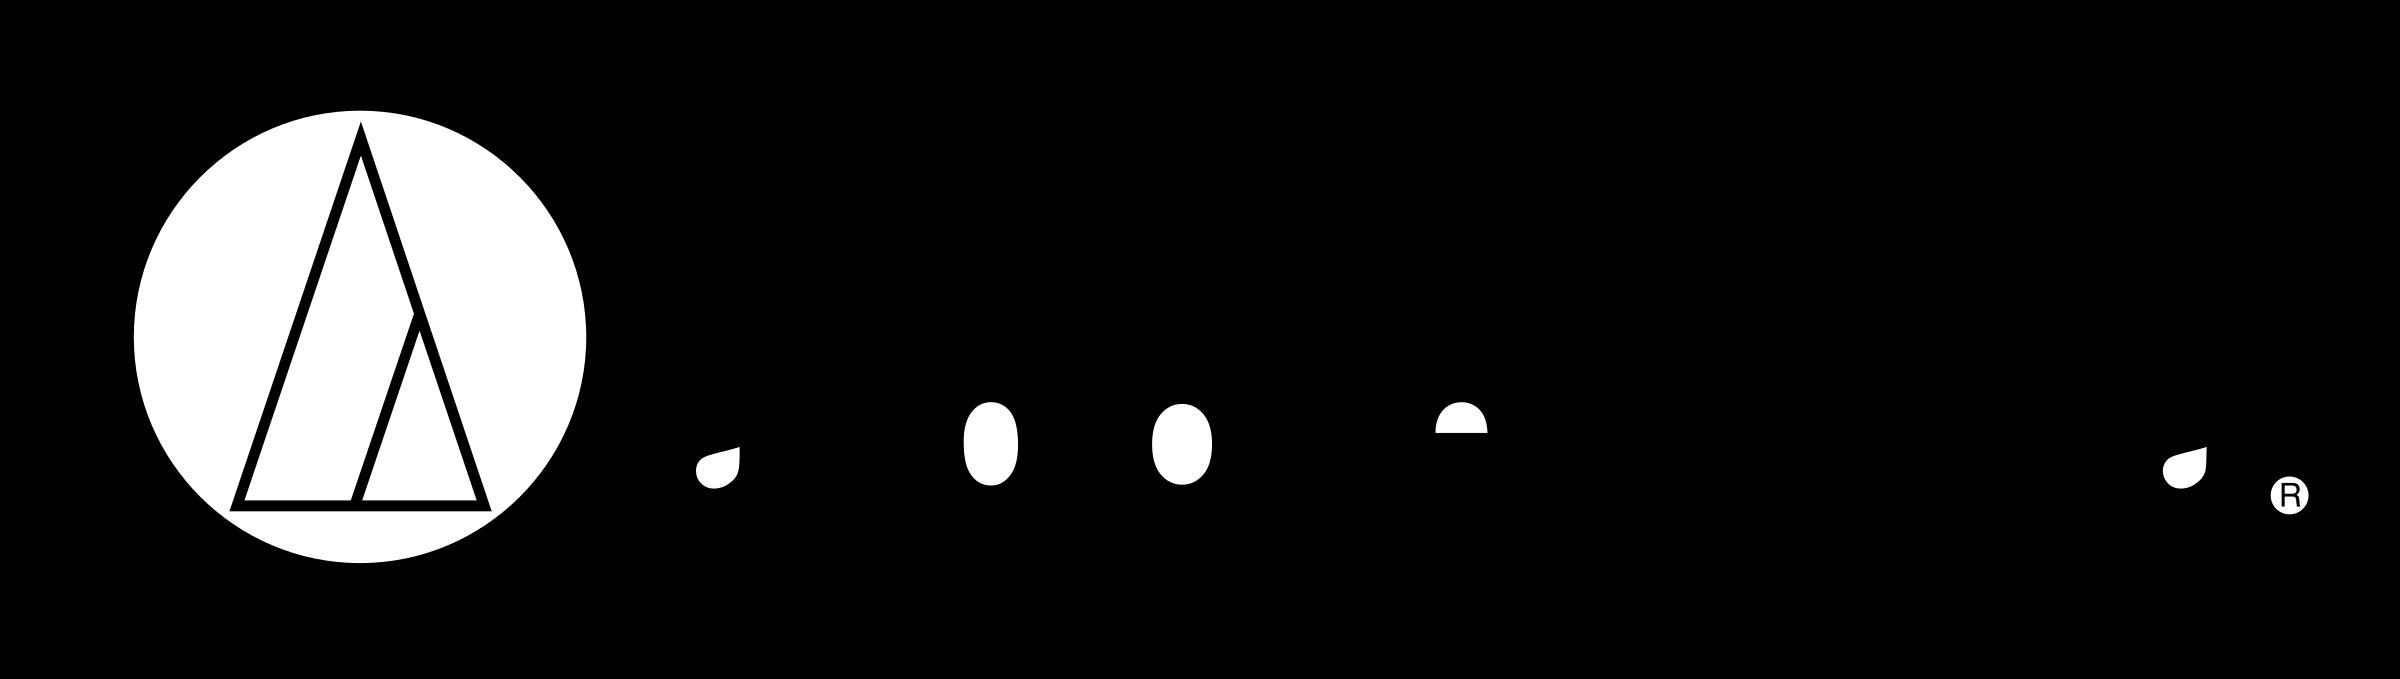 audio-technica-logo-png-transparent-1